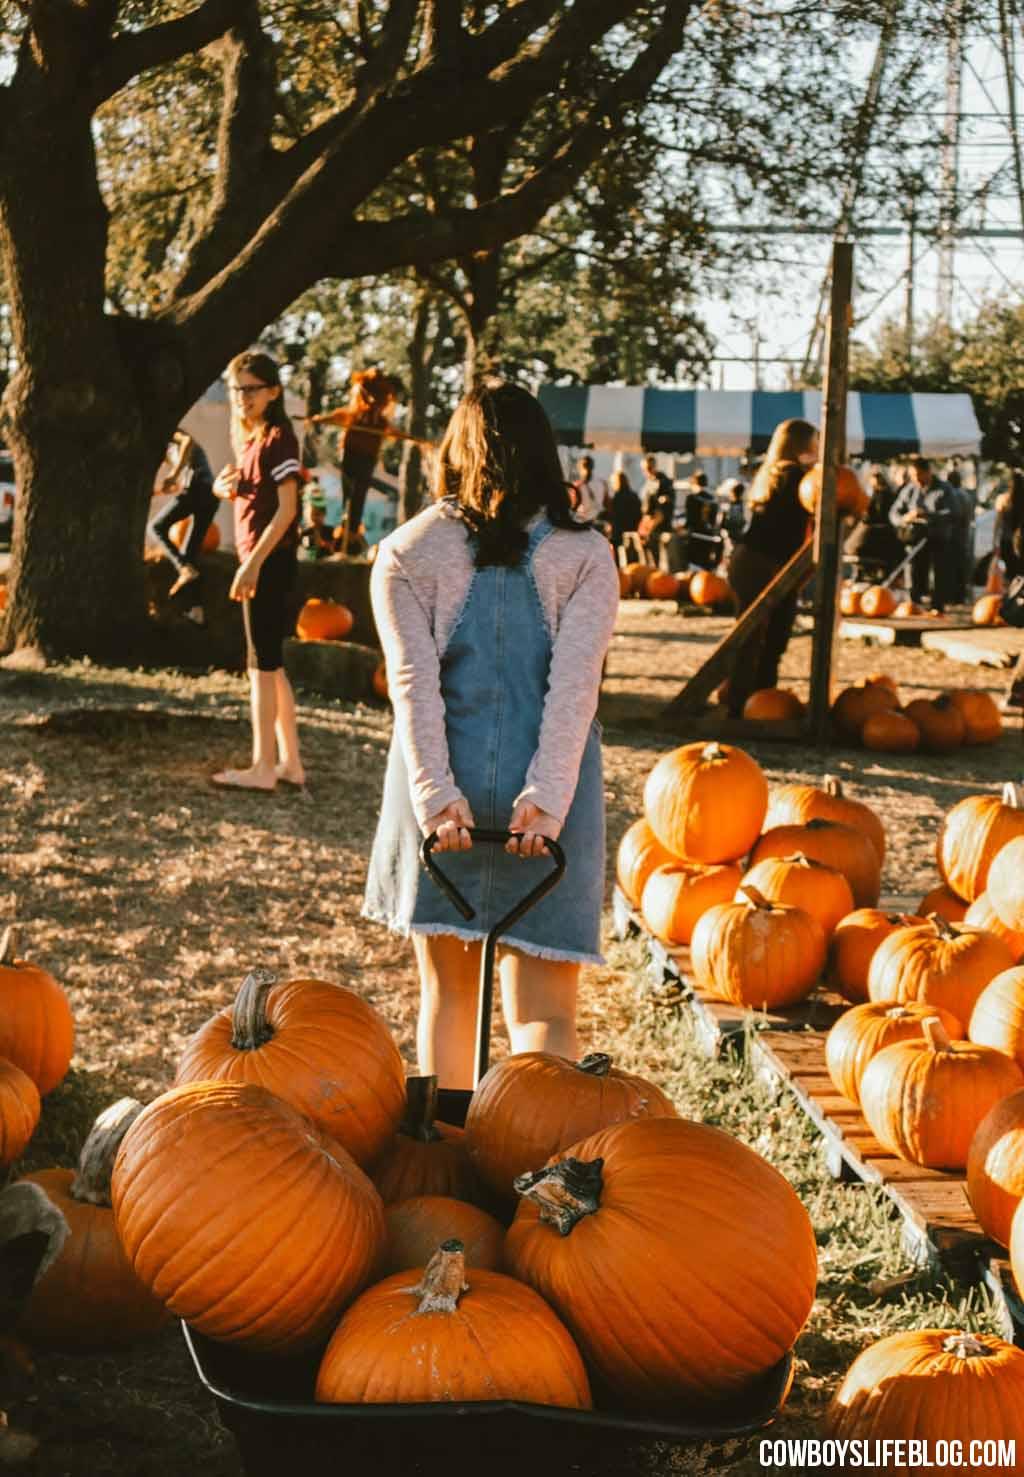 The Best Pumpkin Patches in DFW (2021)